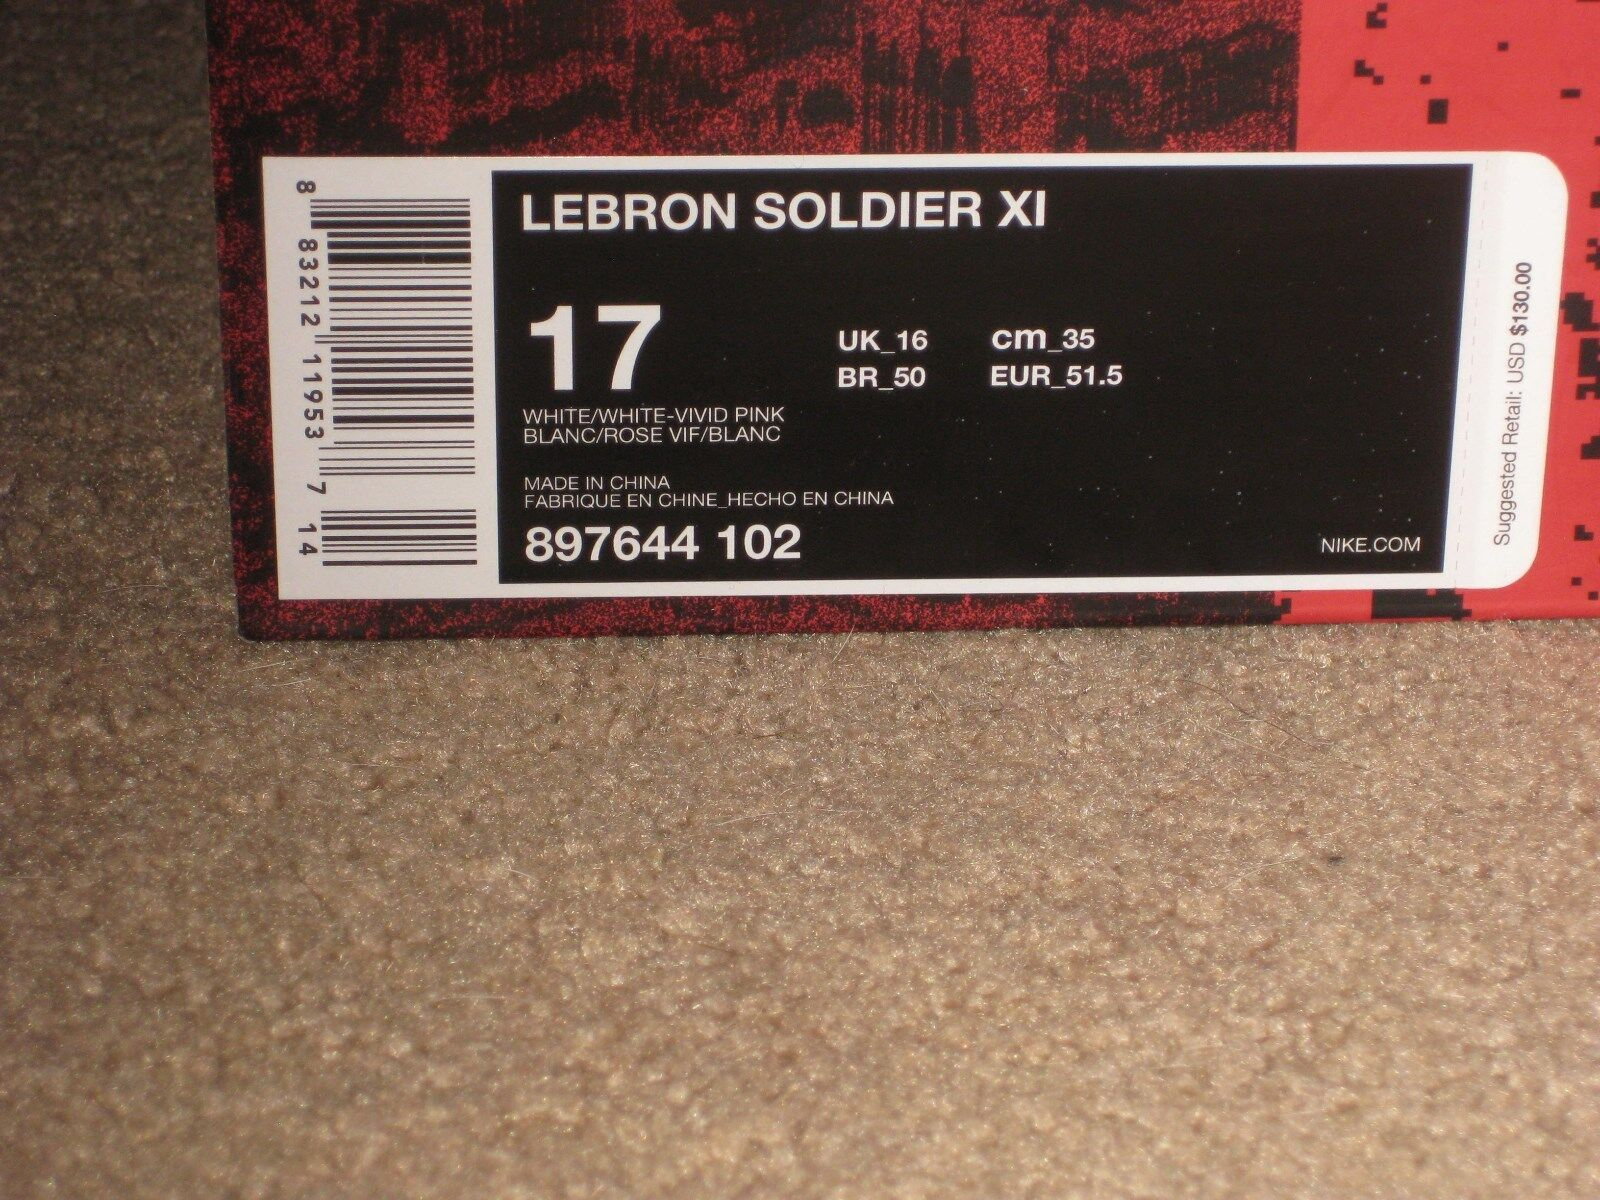 a1bdf80612750 Nike Lebron Soldier XI Shoes Mens Sz 17 897644 102 Lebron James RARE Size  for sale online